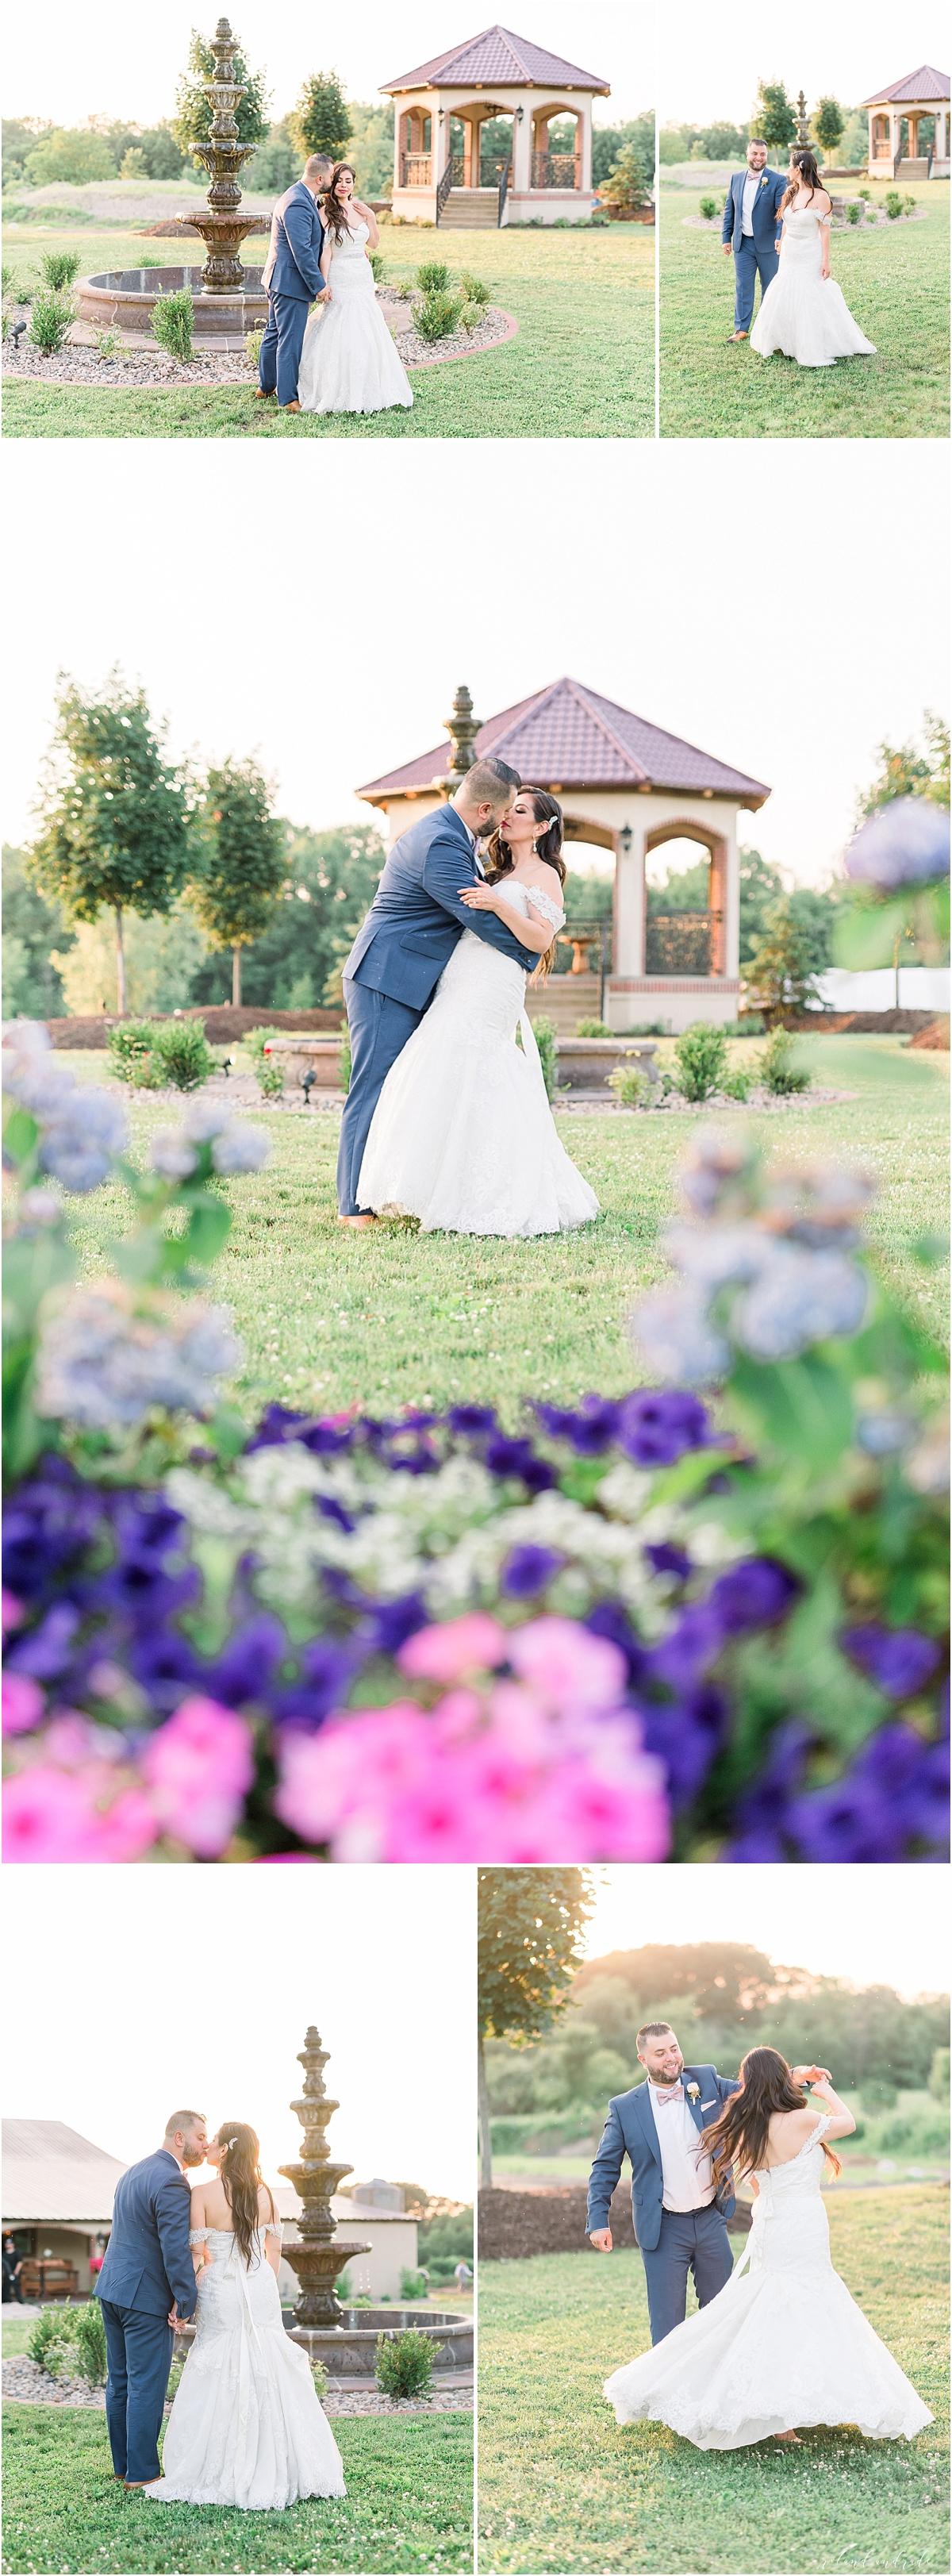 Rancho Los Guzman Wedding Joliet, Joliet Wedding, Joliet Wedding Photographer, Chicago Wedding Photographer, Best Photographer In Joliet, Best Photographer In Chicago, Light And Airy Photographer Chicago_0065.jpg